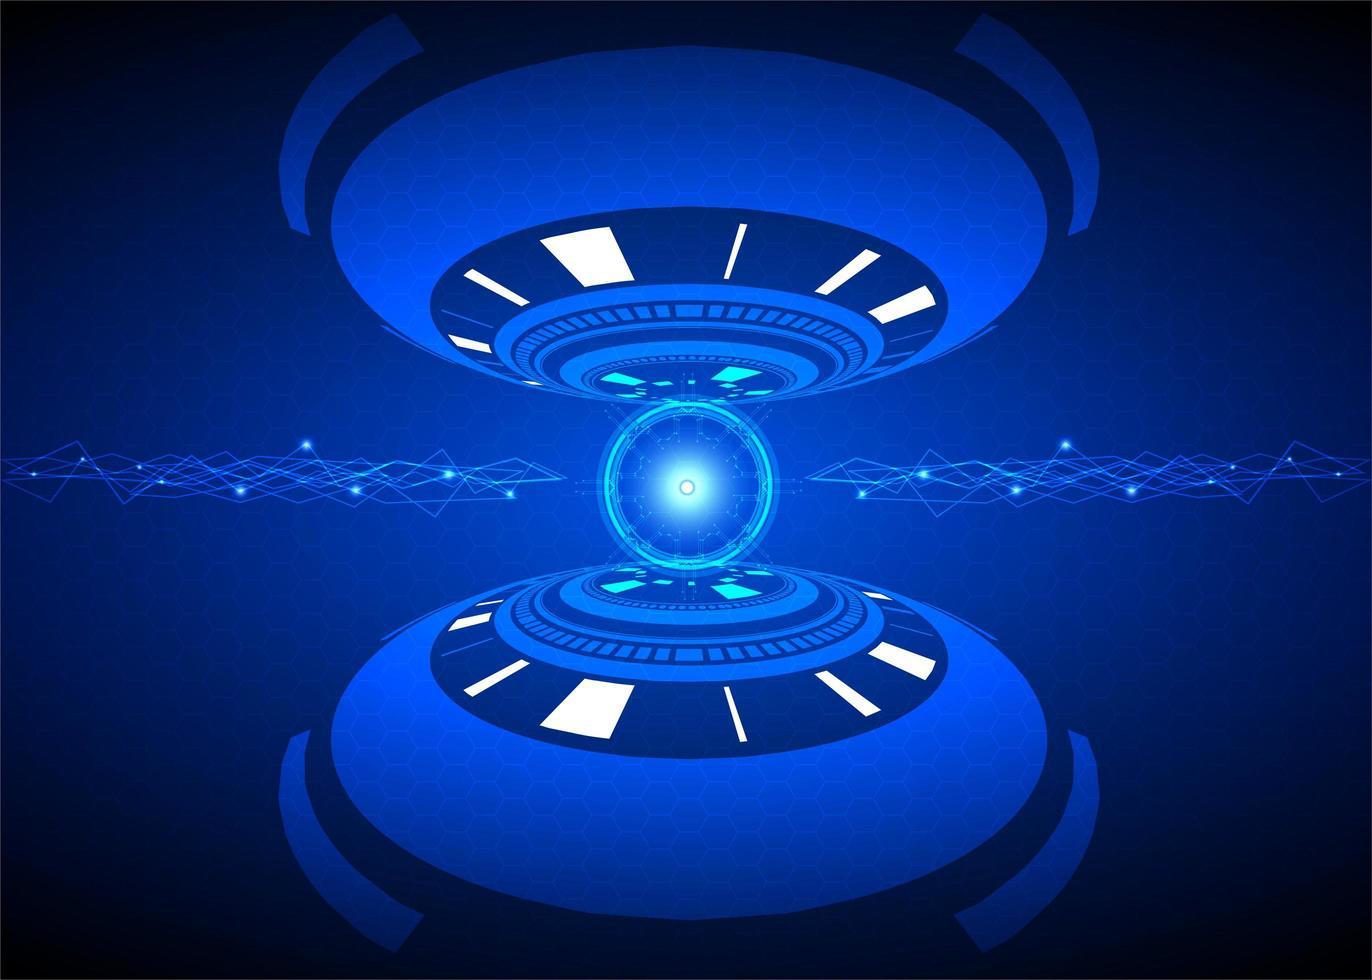 Cyber Security Technology Futuristic Design vector